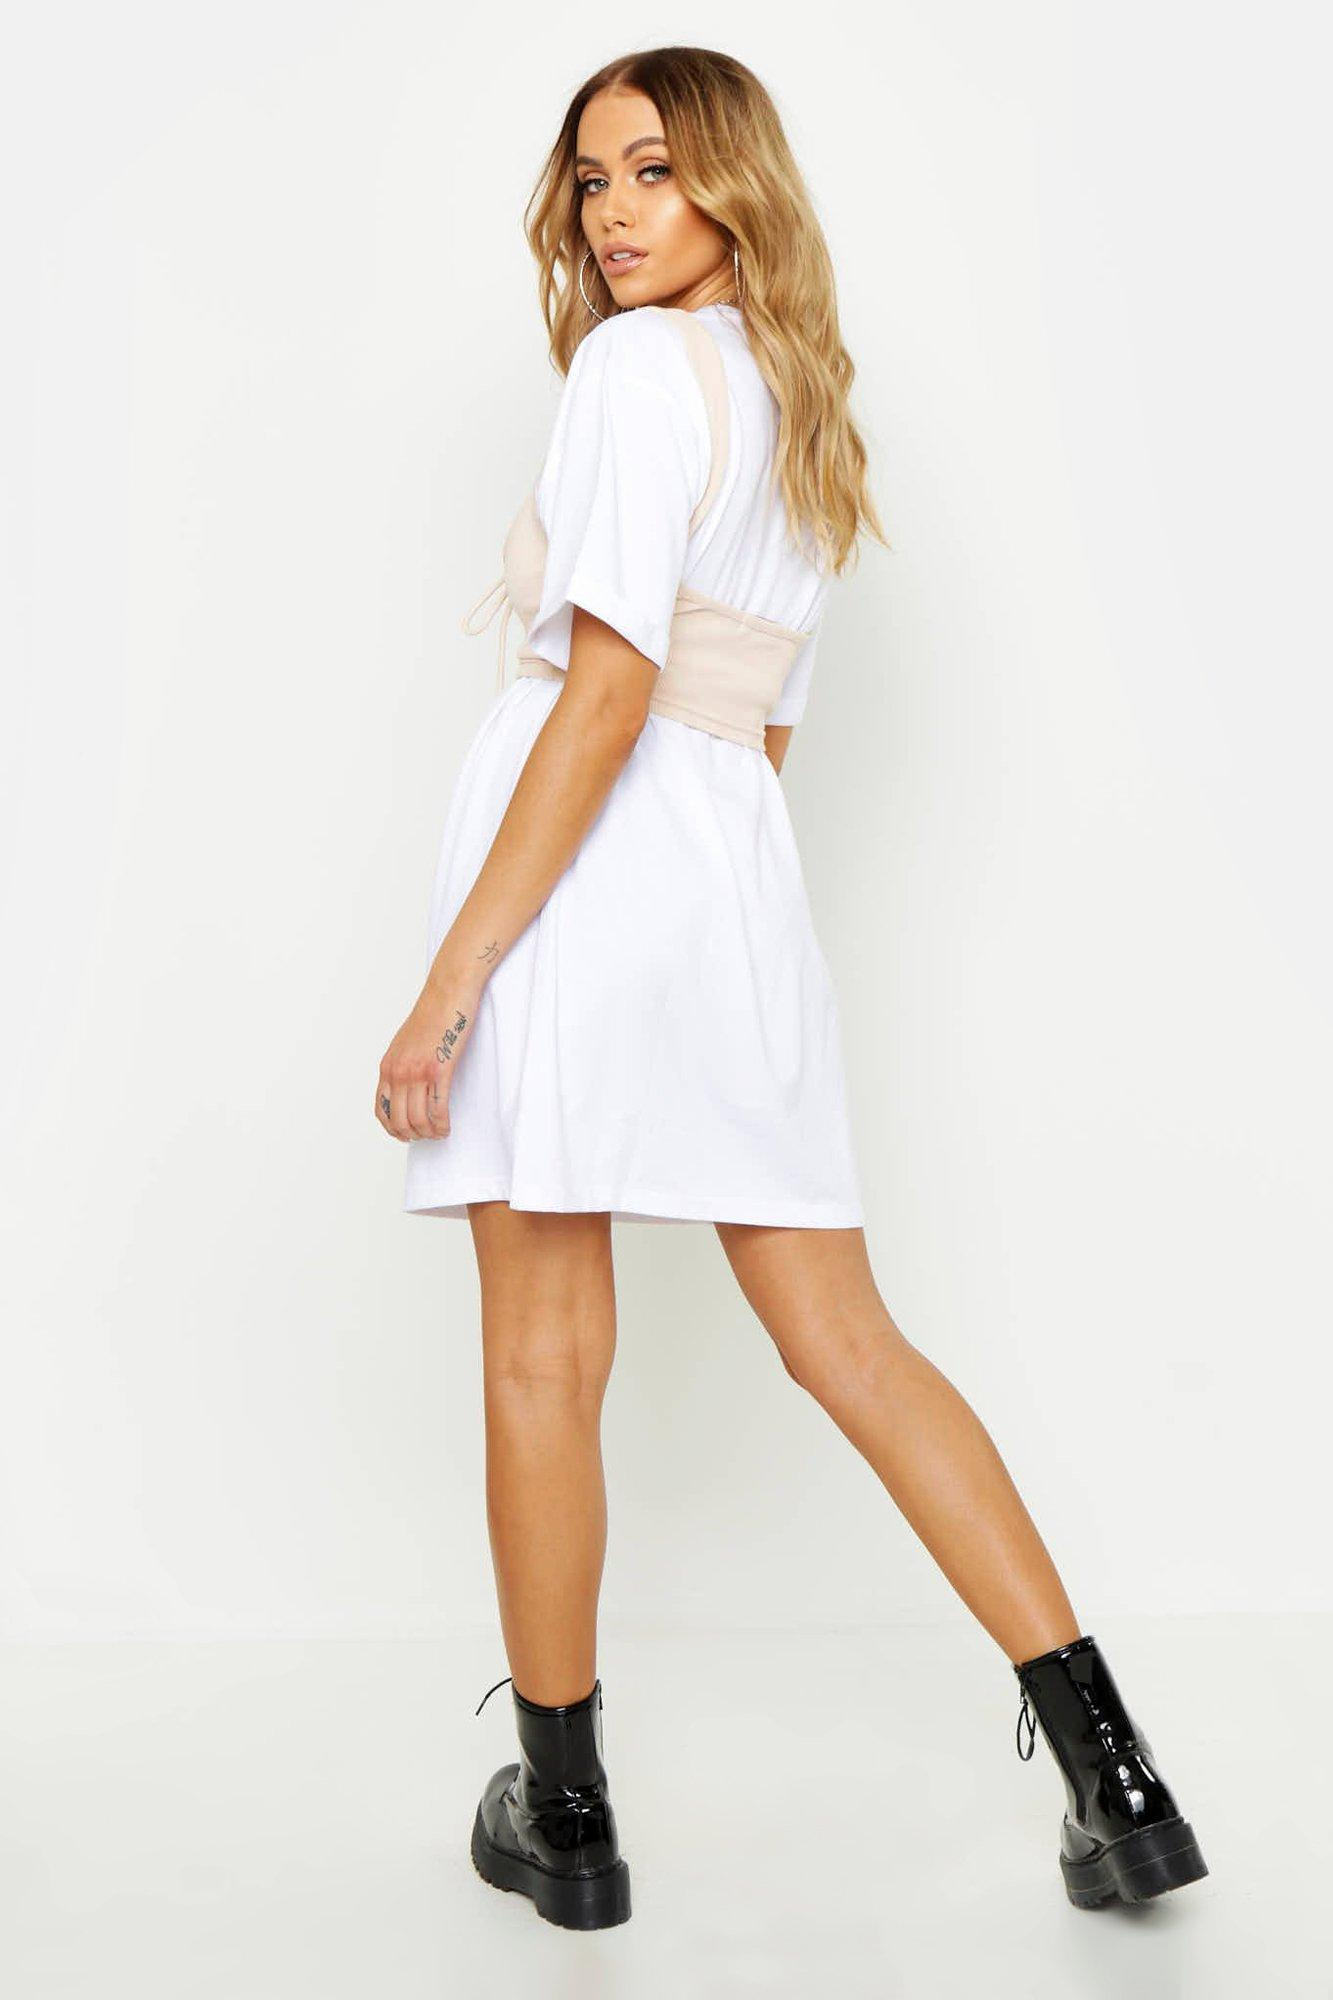 7880b1496c0 Boohoo - Black Corset Detail Oversized Cotton T Shirt Dress - Lyst. View  fullscreen